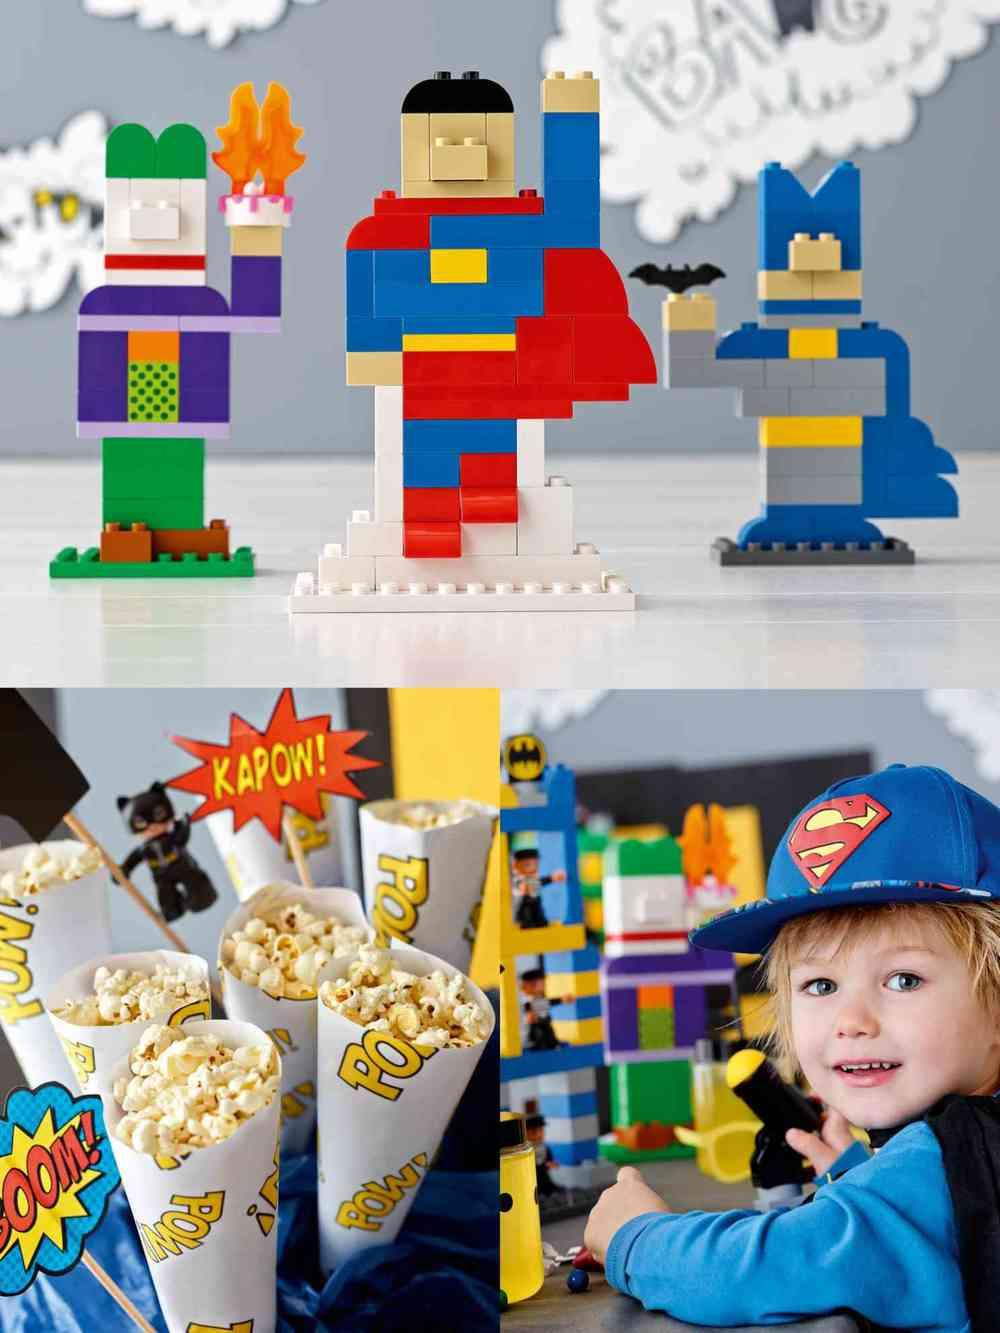 LEGODUPLOsuperheropartybuilds2